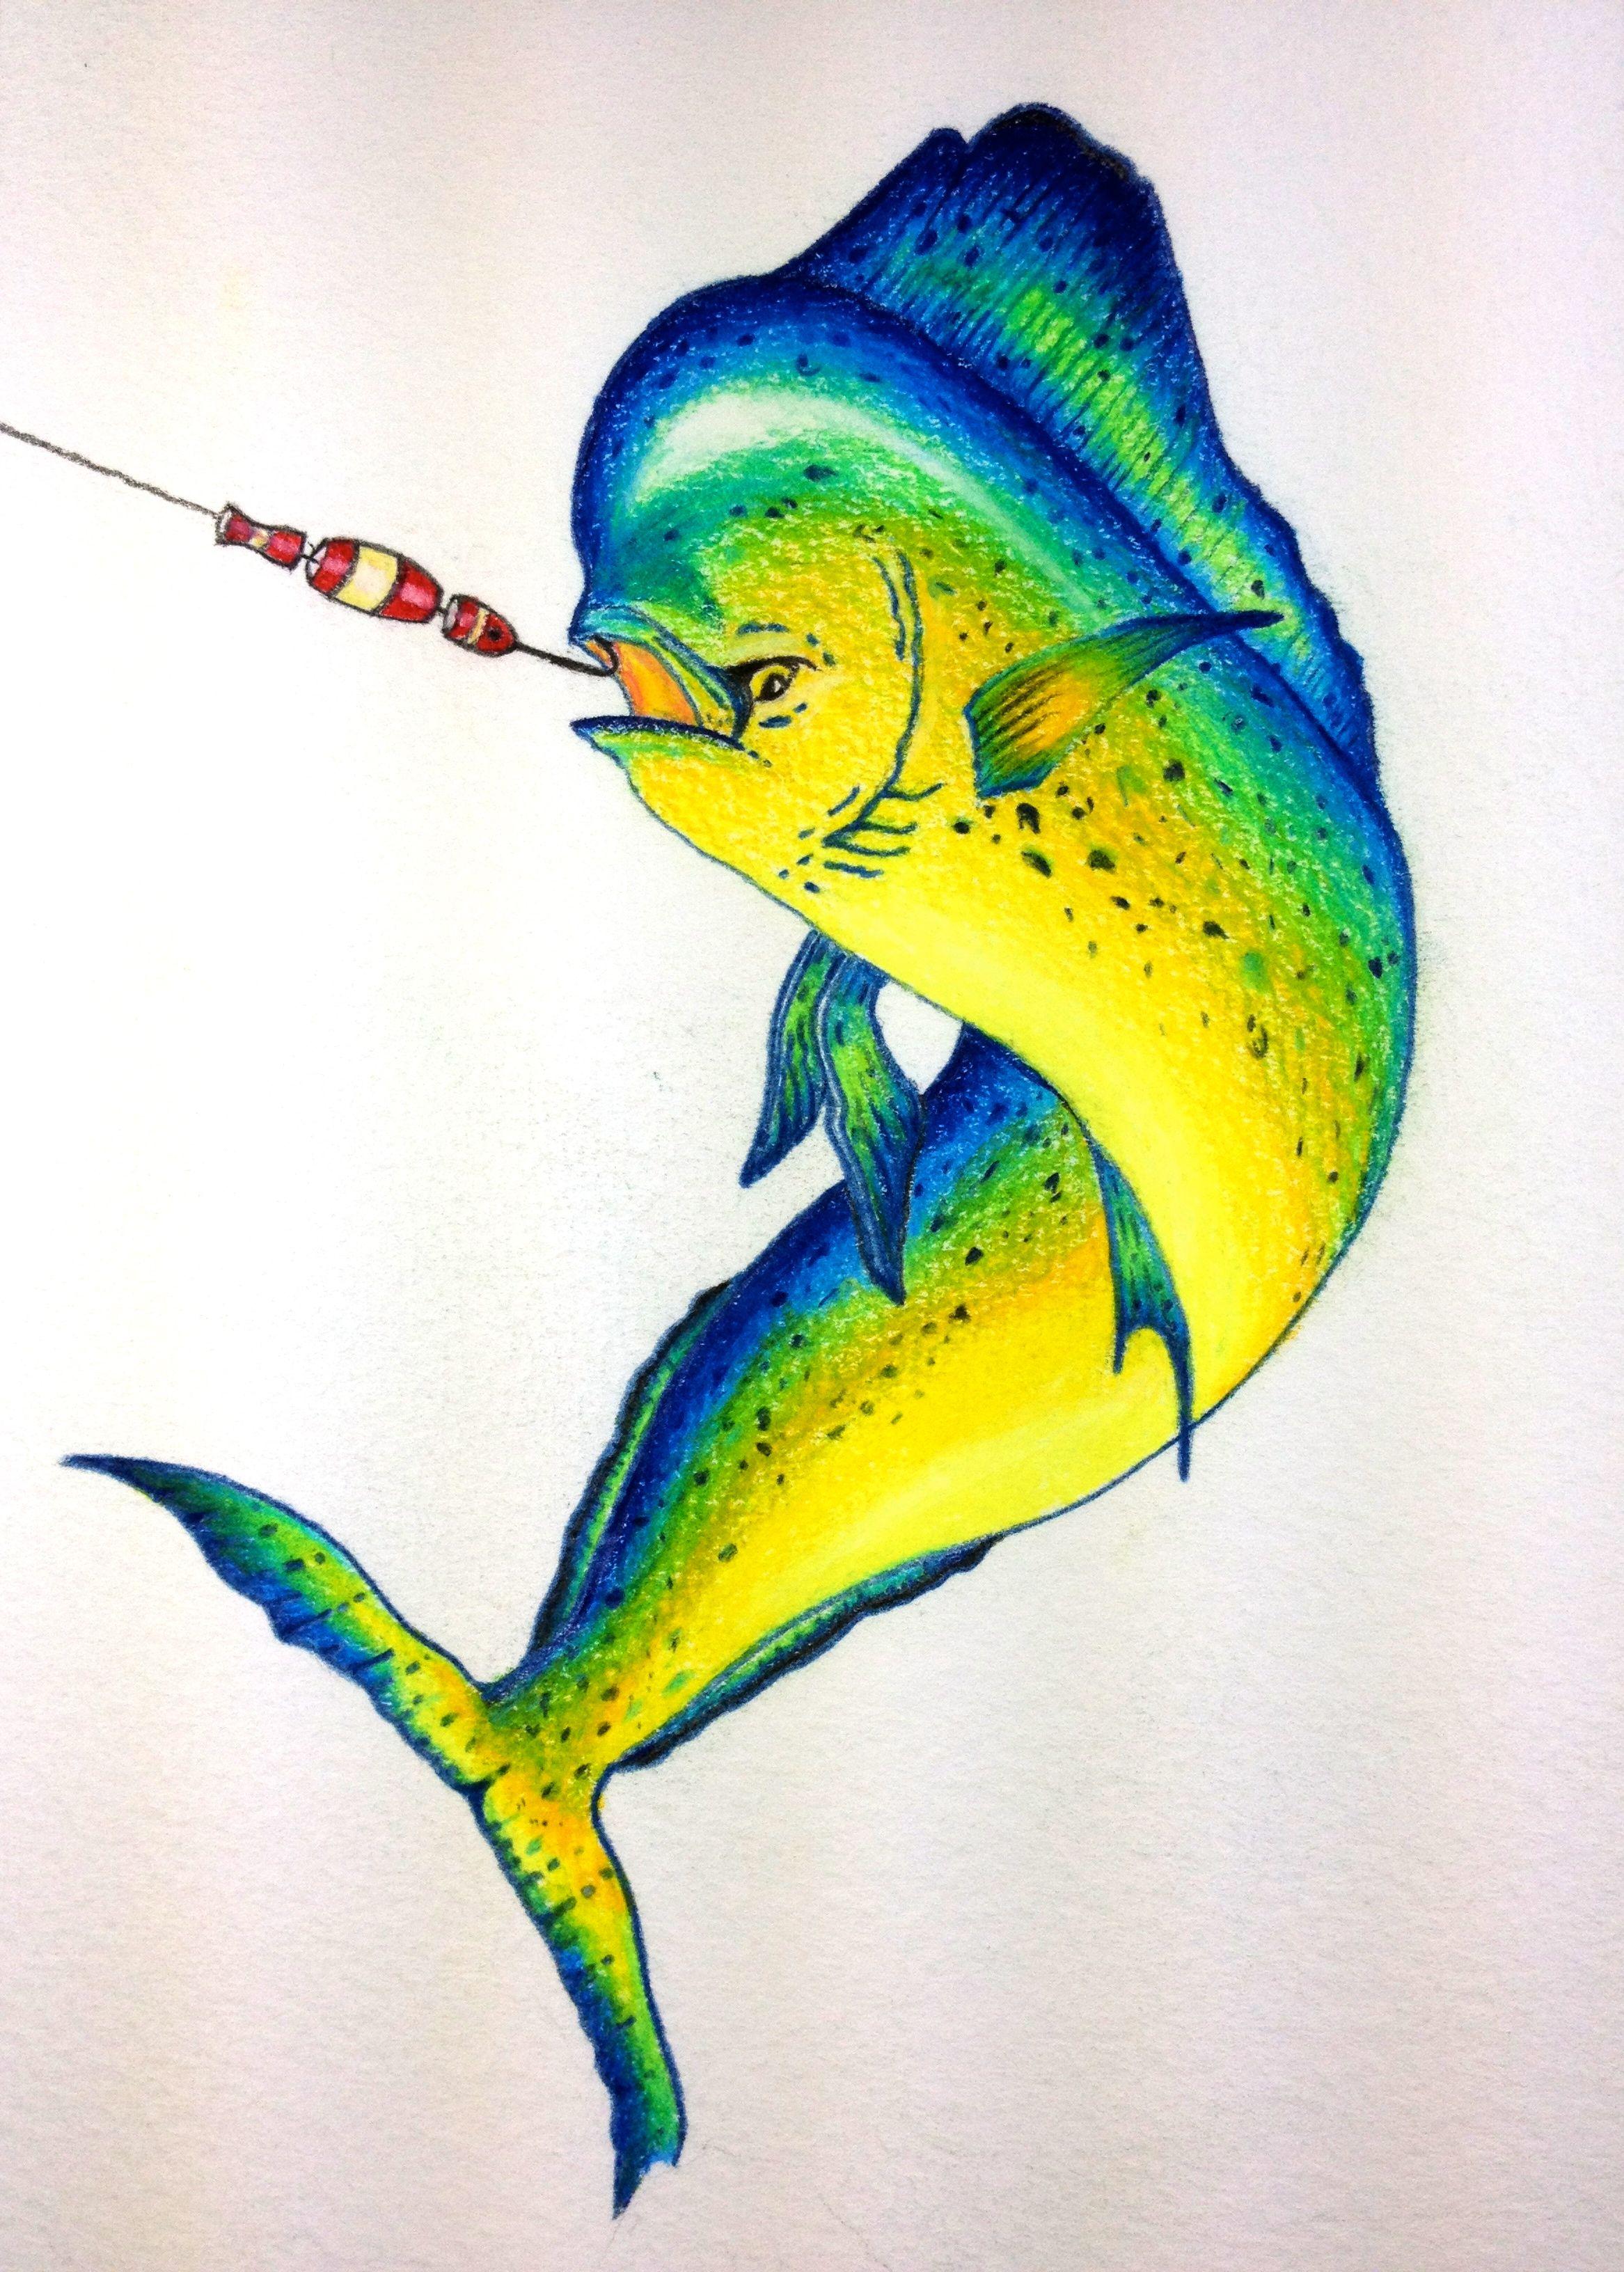 fish mahi mahi hooked up colored pencil artist david feldkamp columbus ohio colored. Black Bedroom Furniture Sets. Home Design Ideas